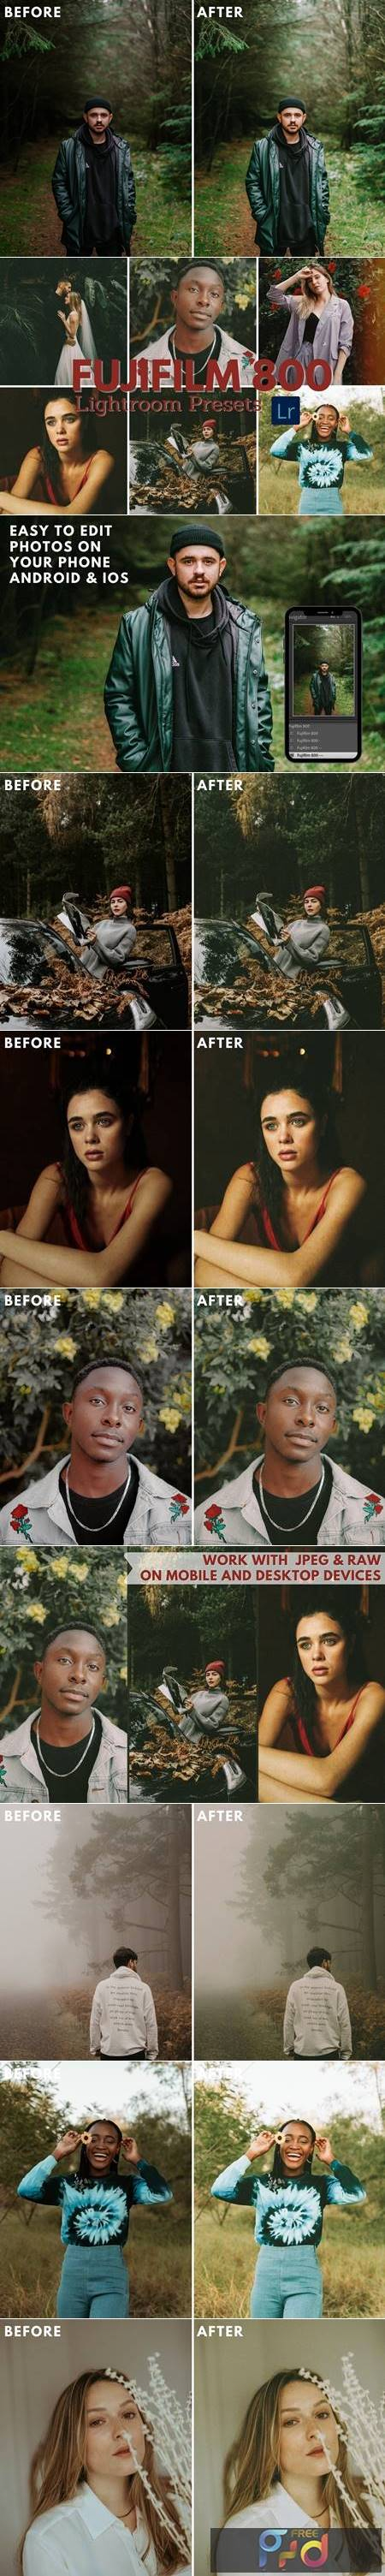 Fujifilm 800 Lightroom Film Presets 5744805 1